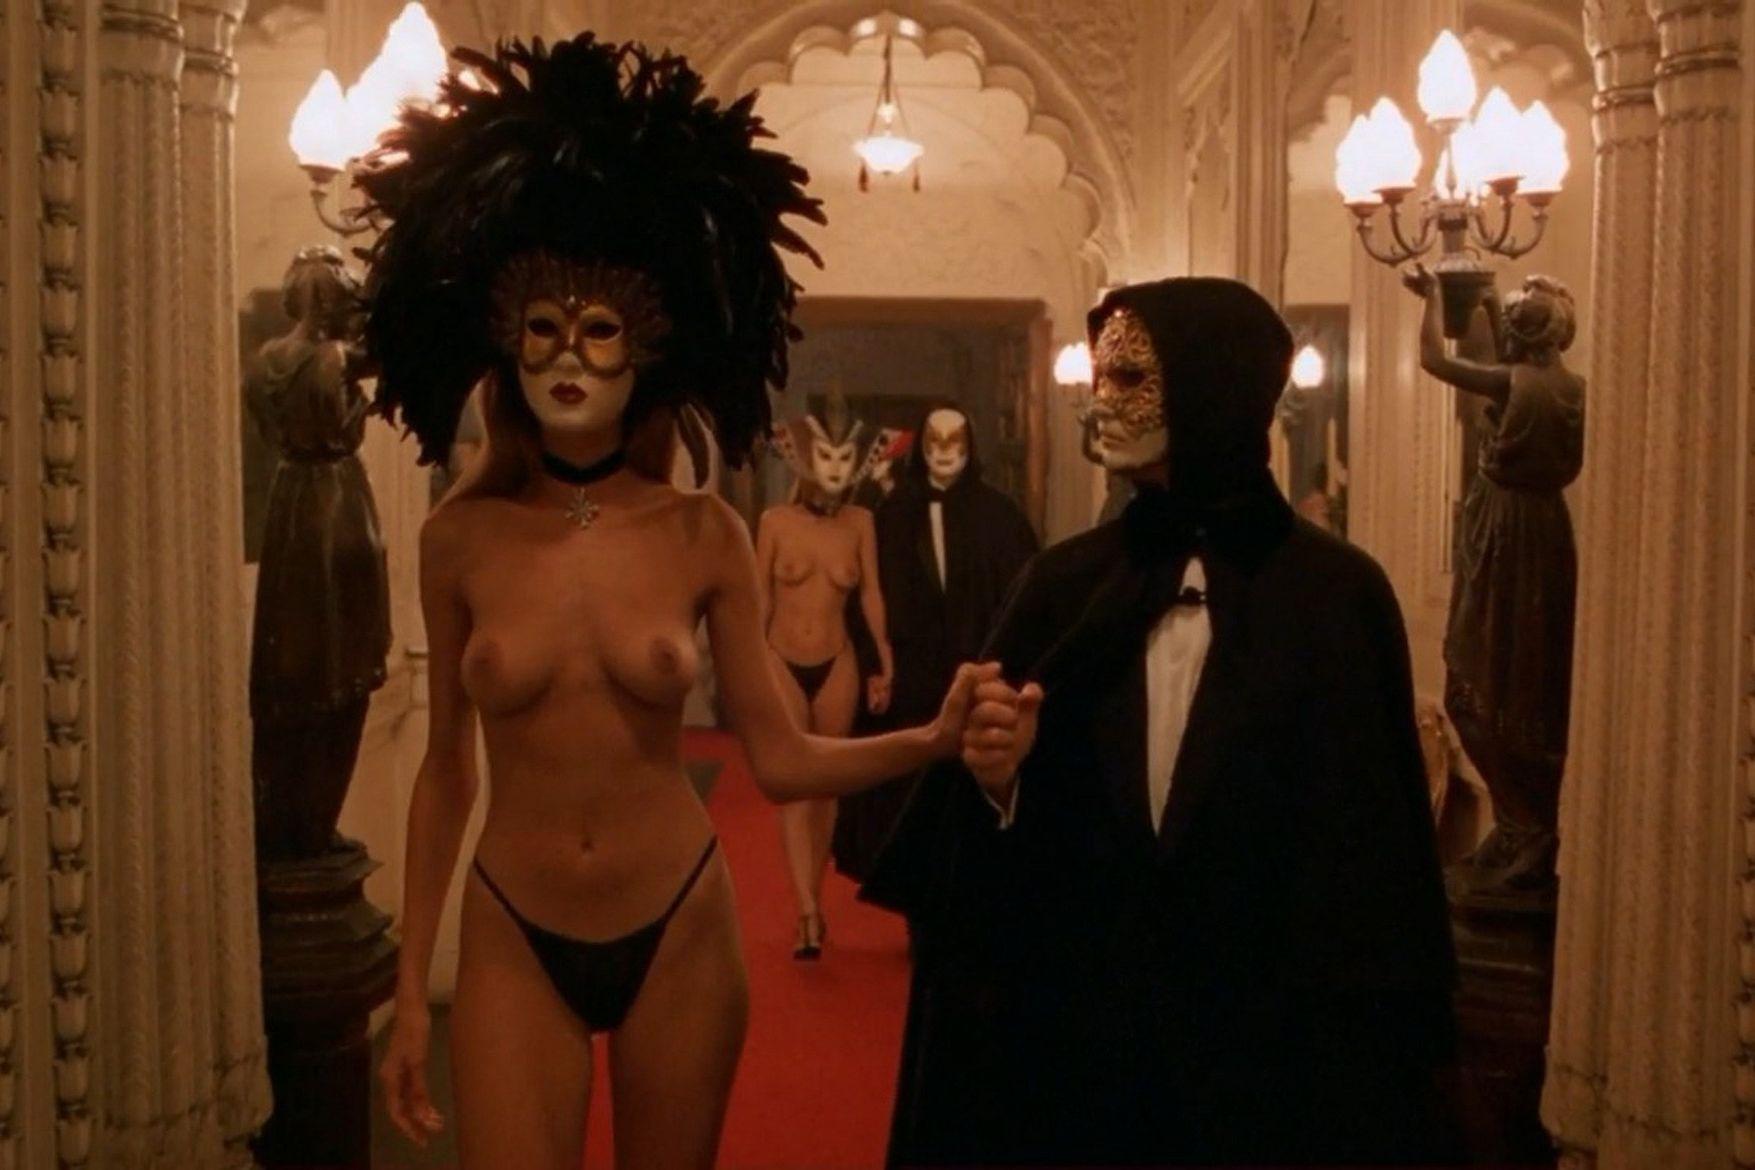 racconti erotici gay al cinema Brescia